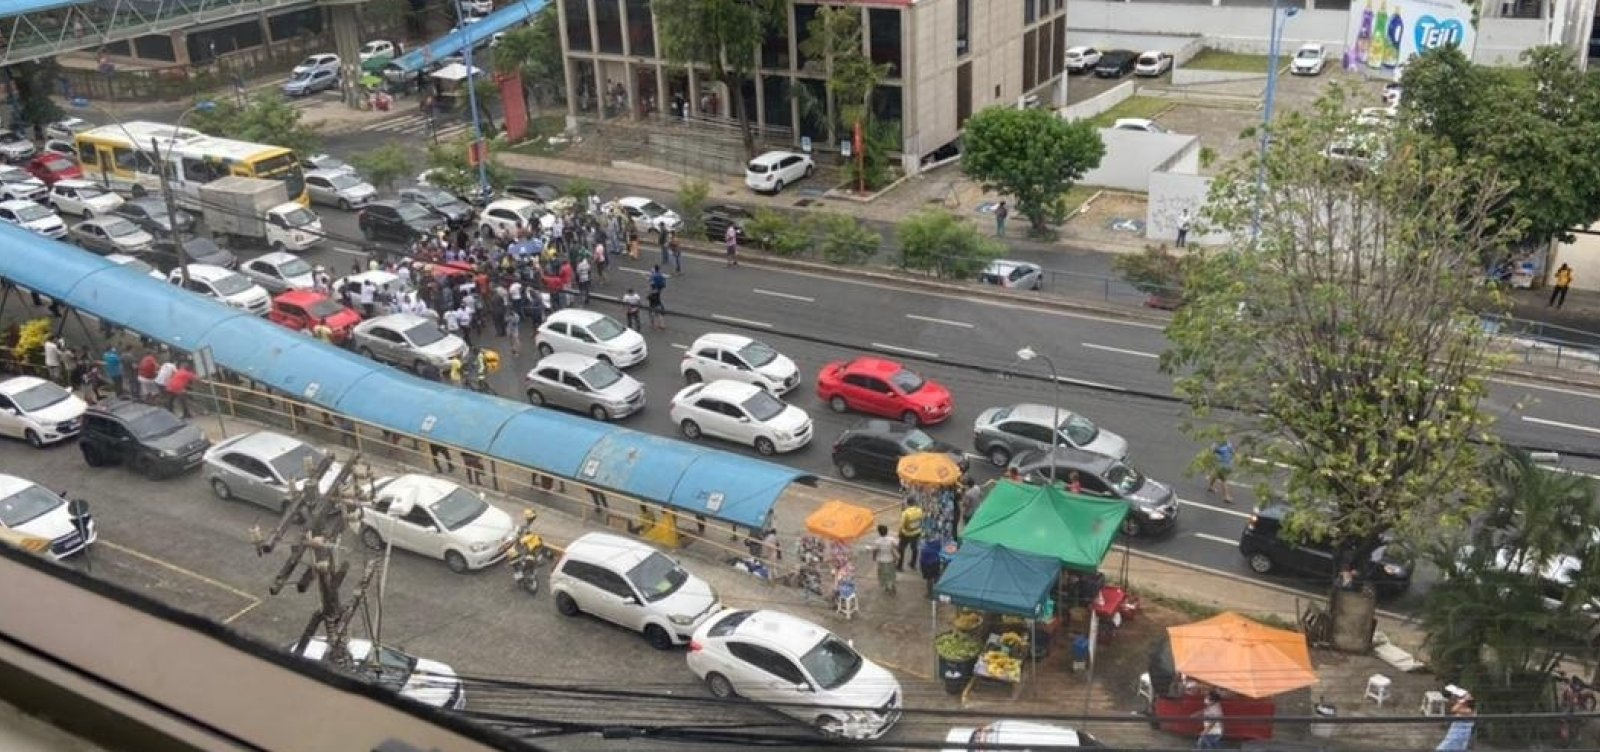 [Protesto de motoristas de app trava Avenida Tancredo Neves após manifestante ser detido pela PM]